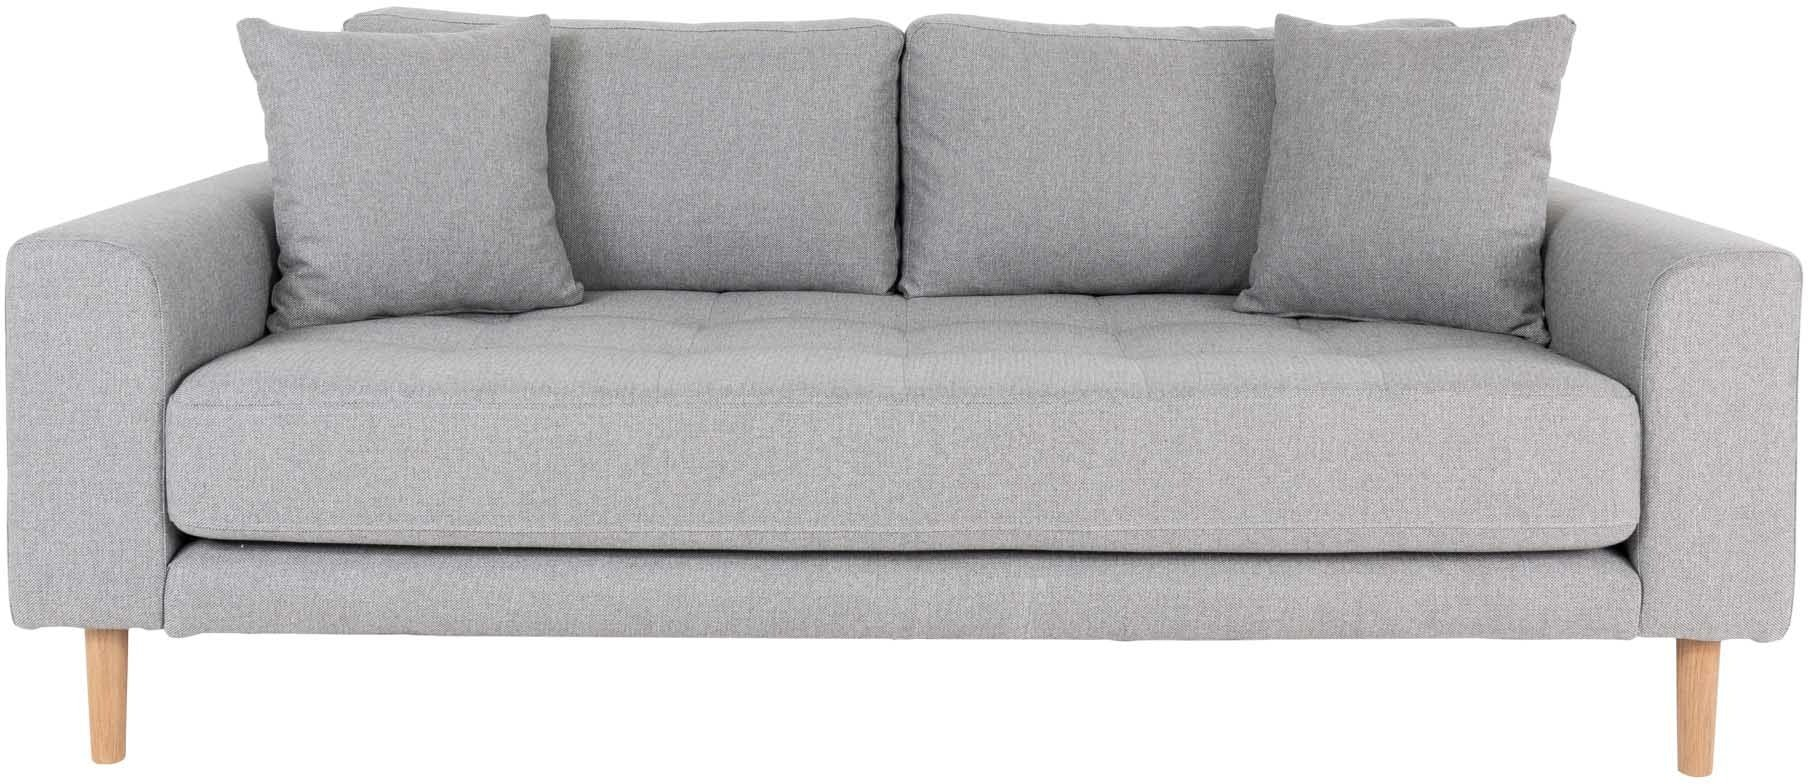 Lido, 2,5-personers sofa, Stof by Nordby (H: 76 cm. B: 180 cm. L: 93 cm., Lysegrå)